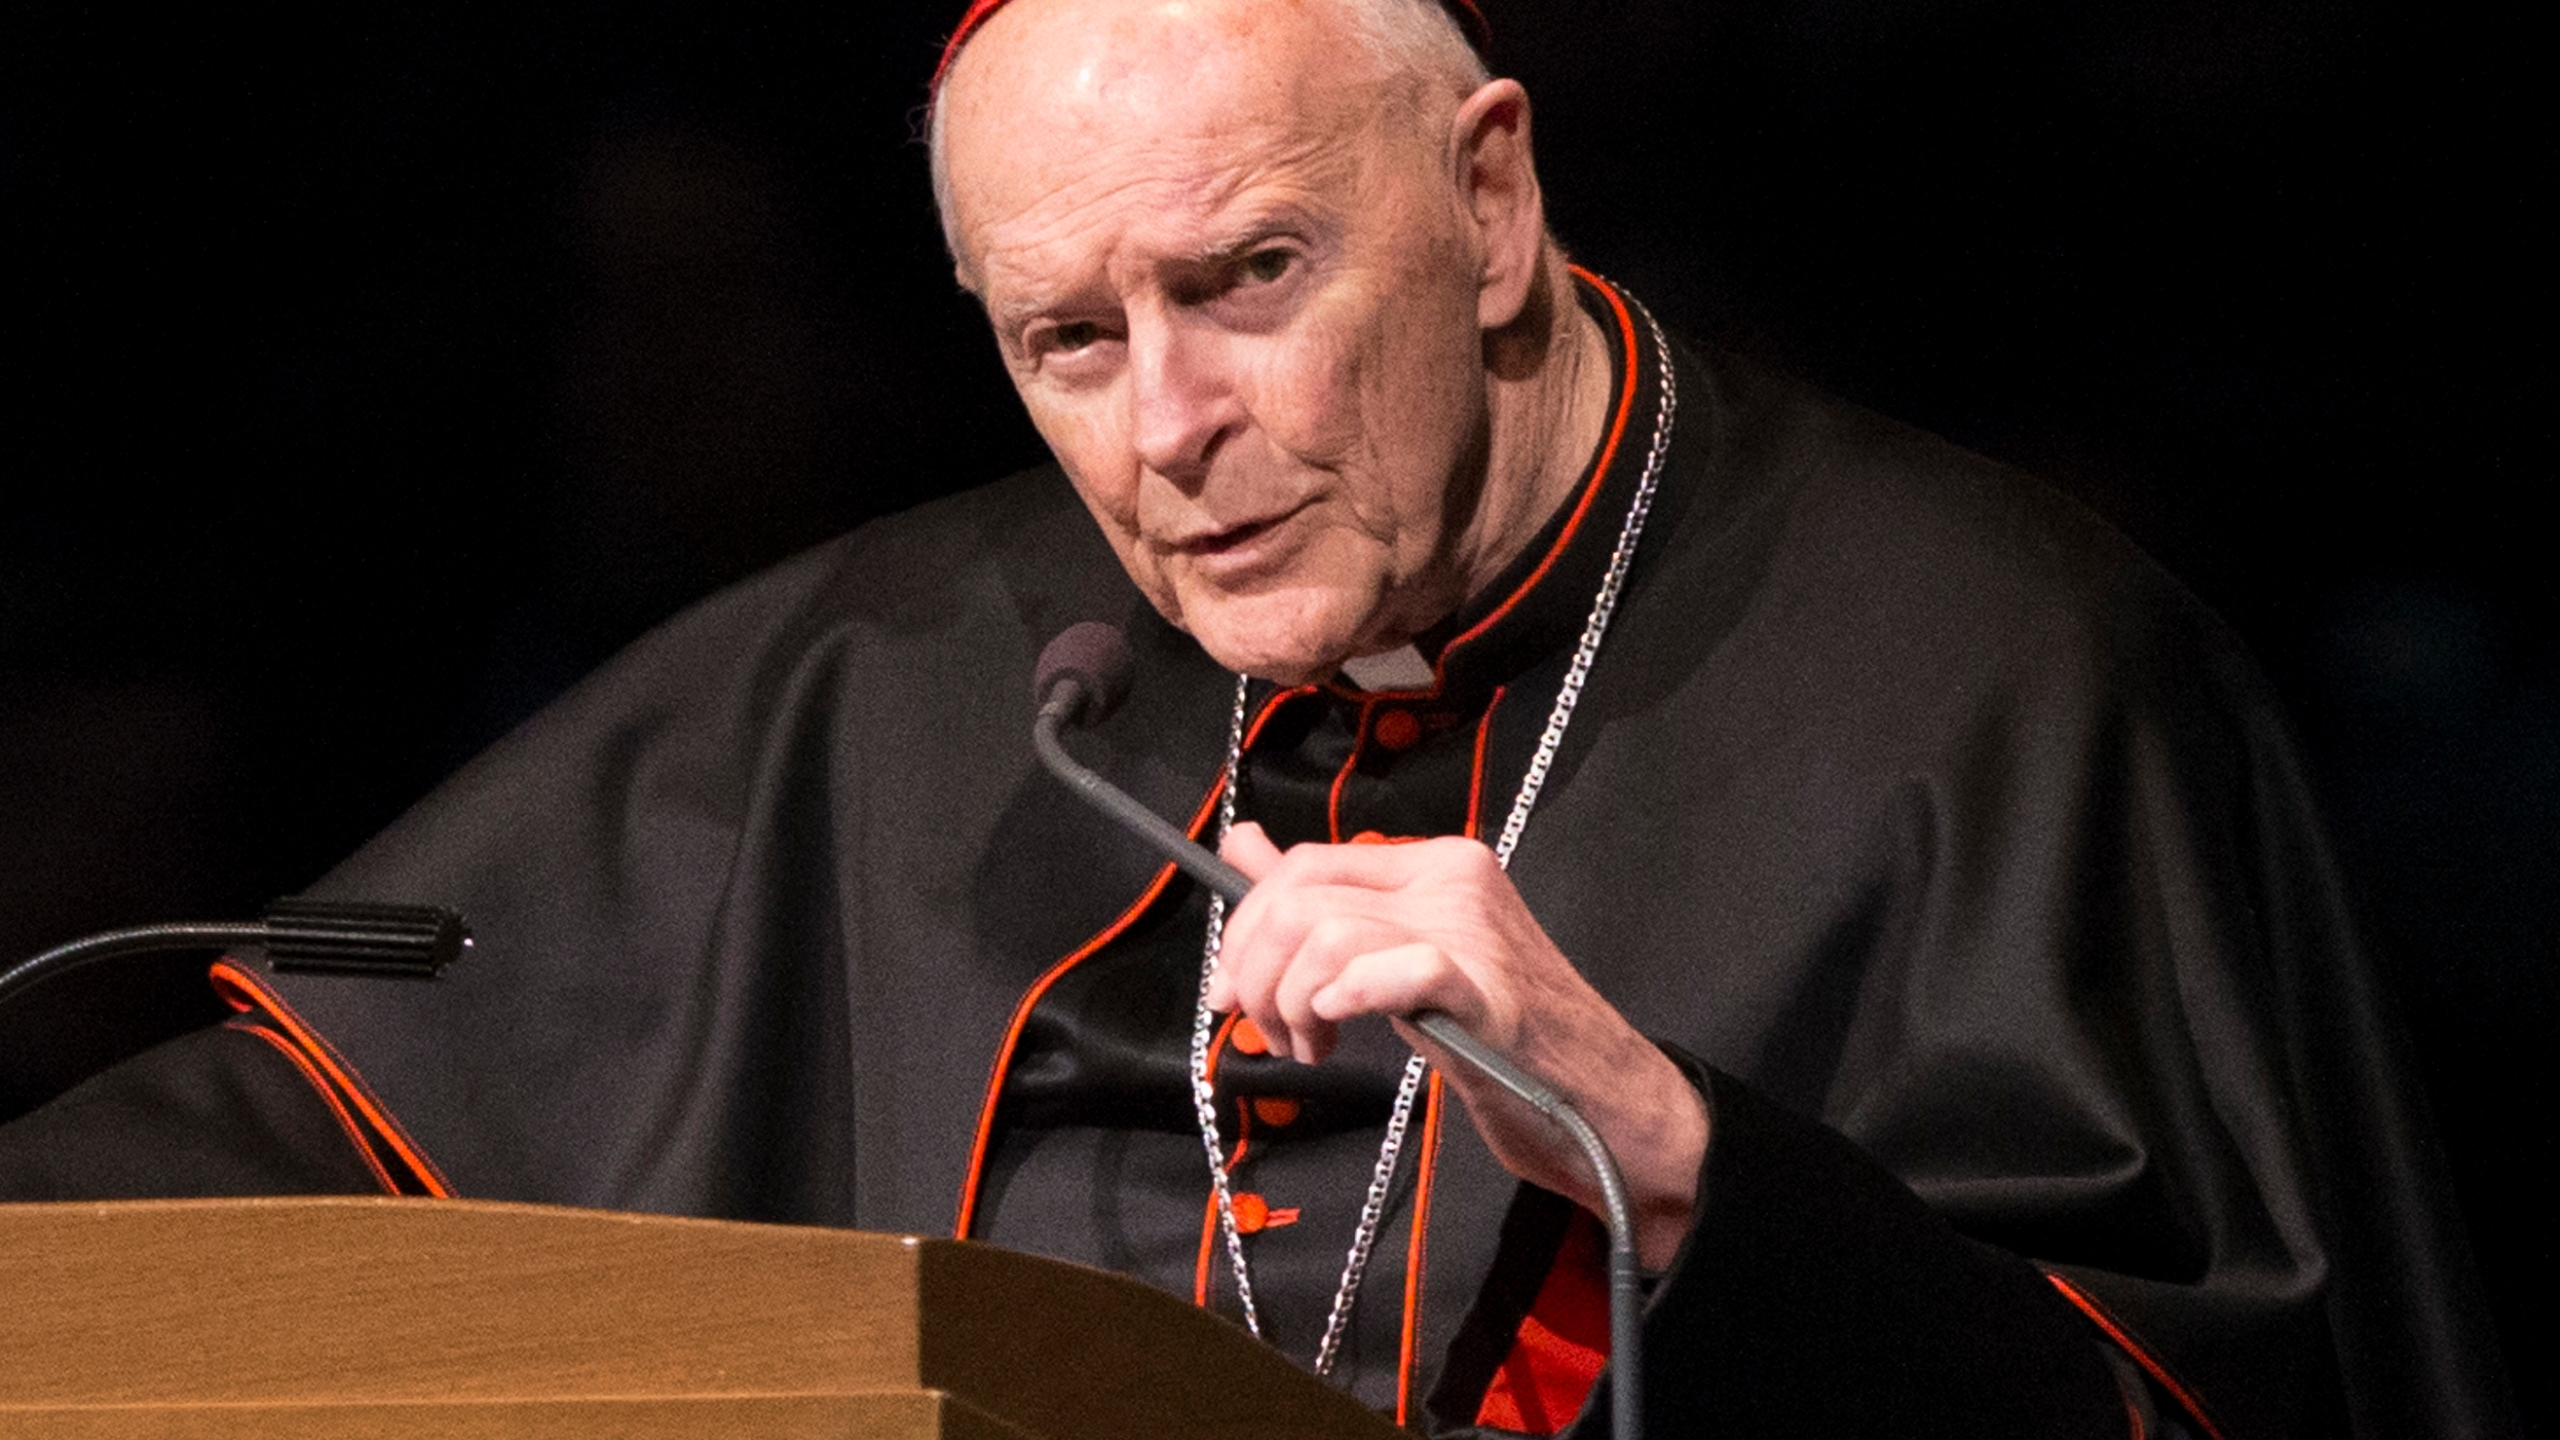 Vatican_Cardinal_Resignation_27480-159532.jpg82353590